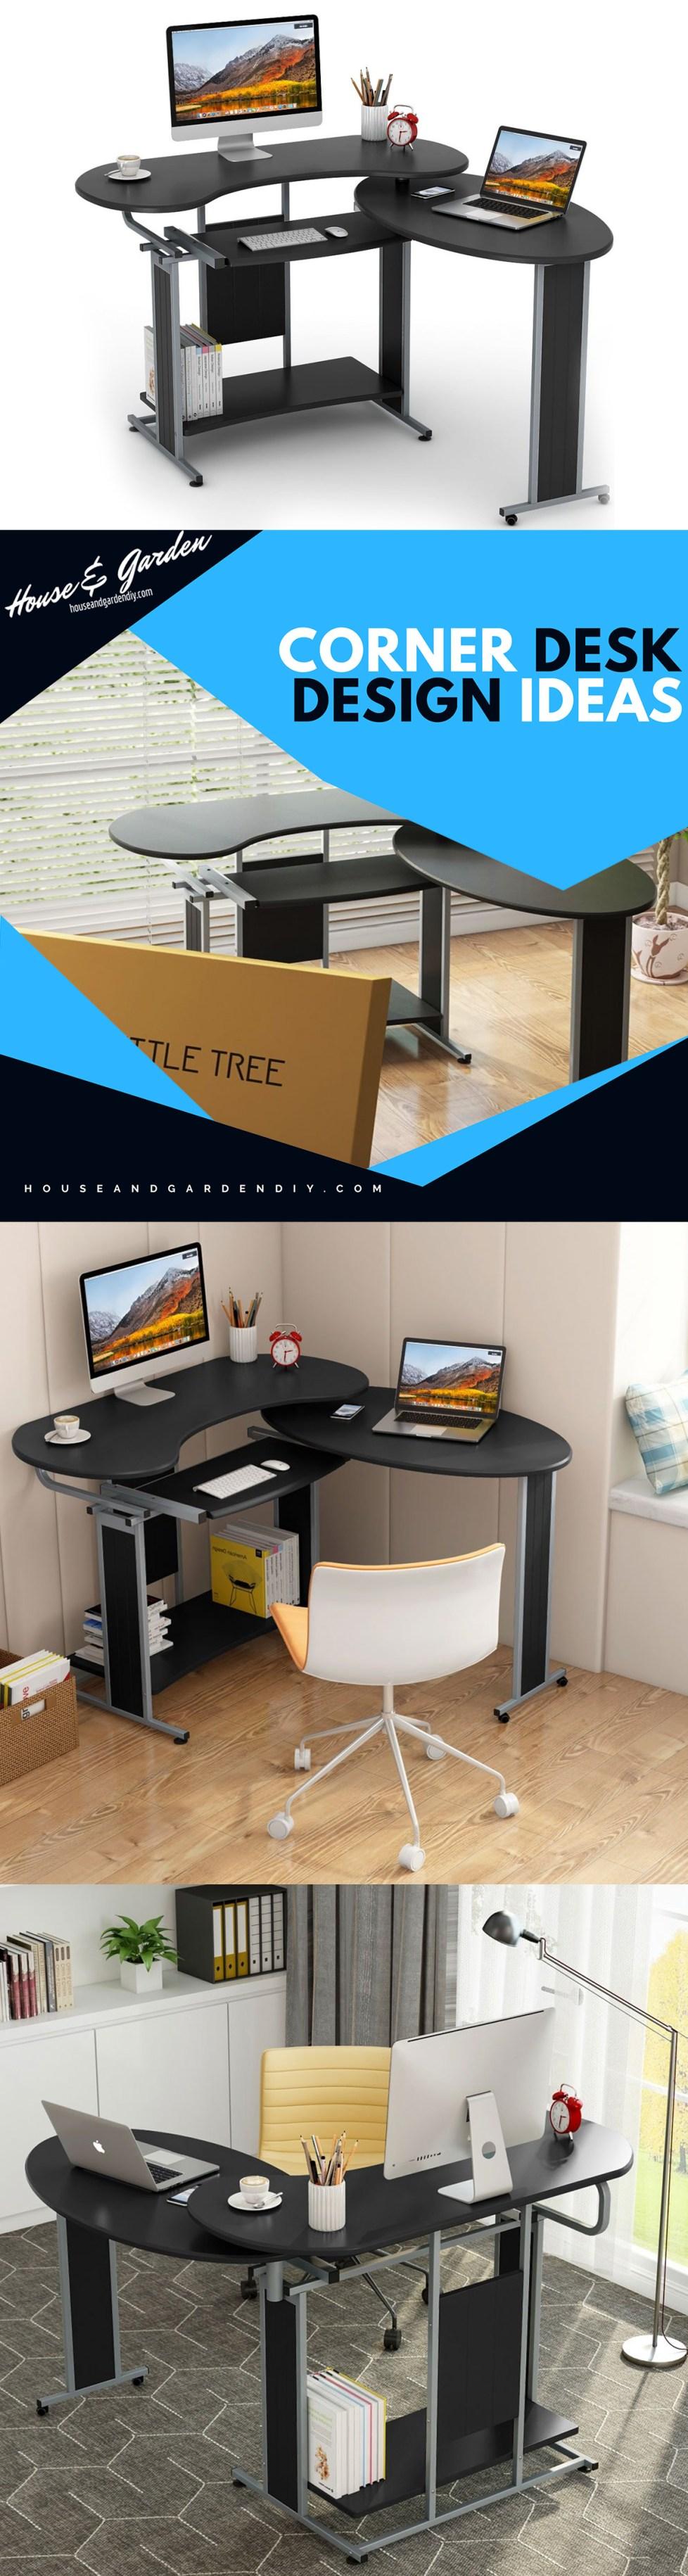 built in corner desk plans